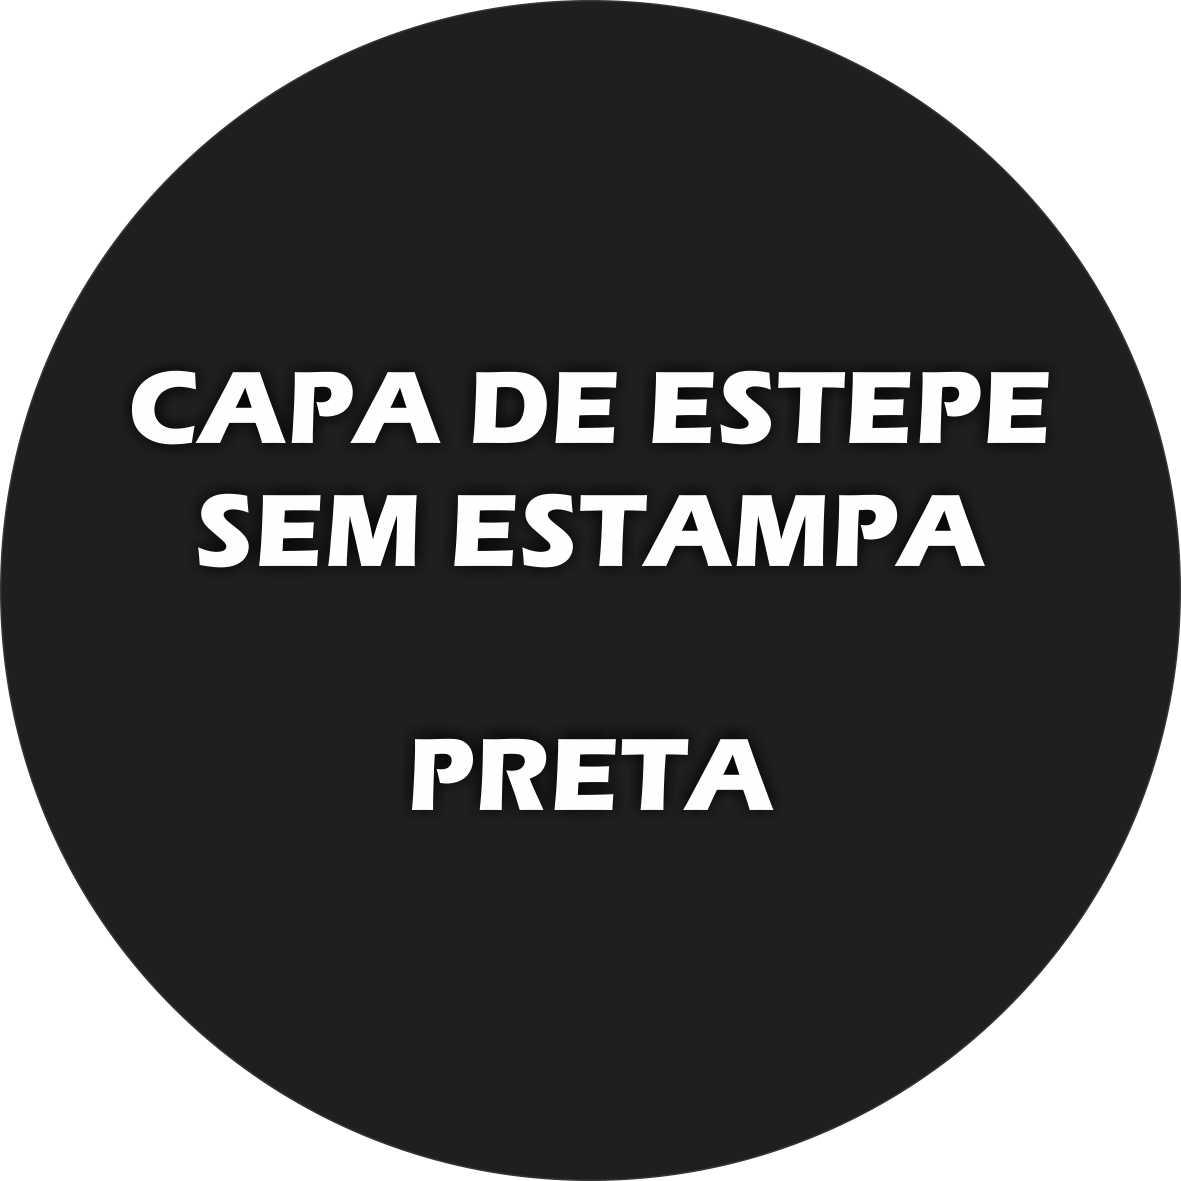 Capa Estepe SEM ESTAMPA - PRETA